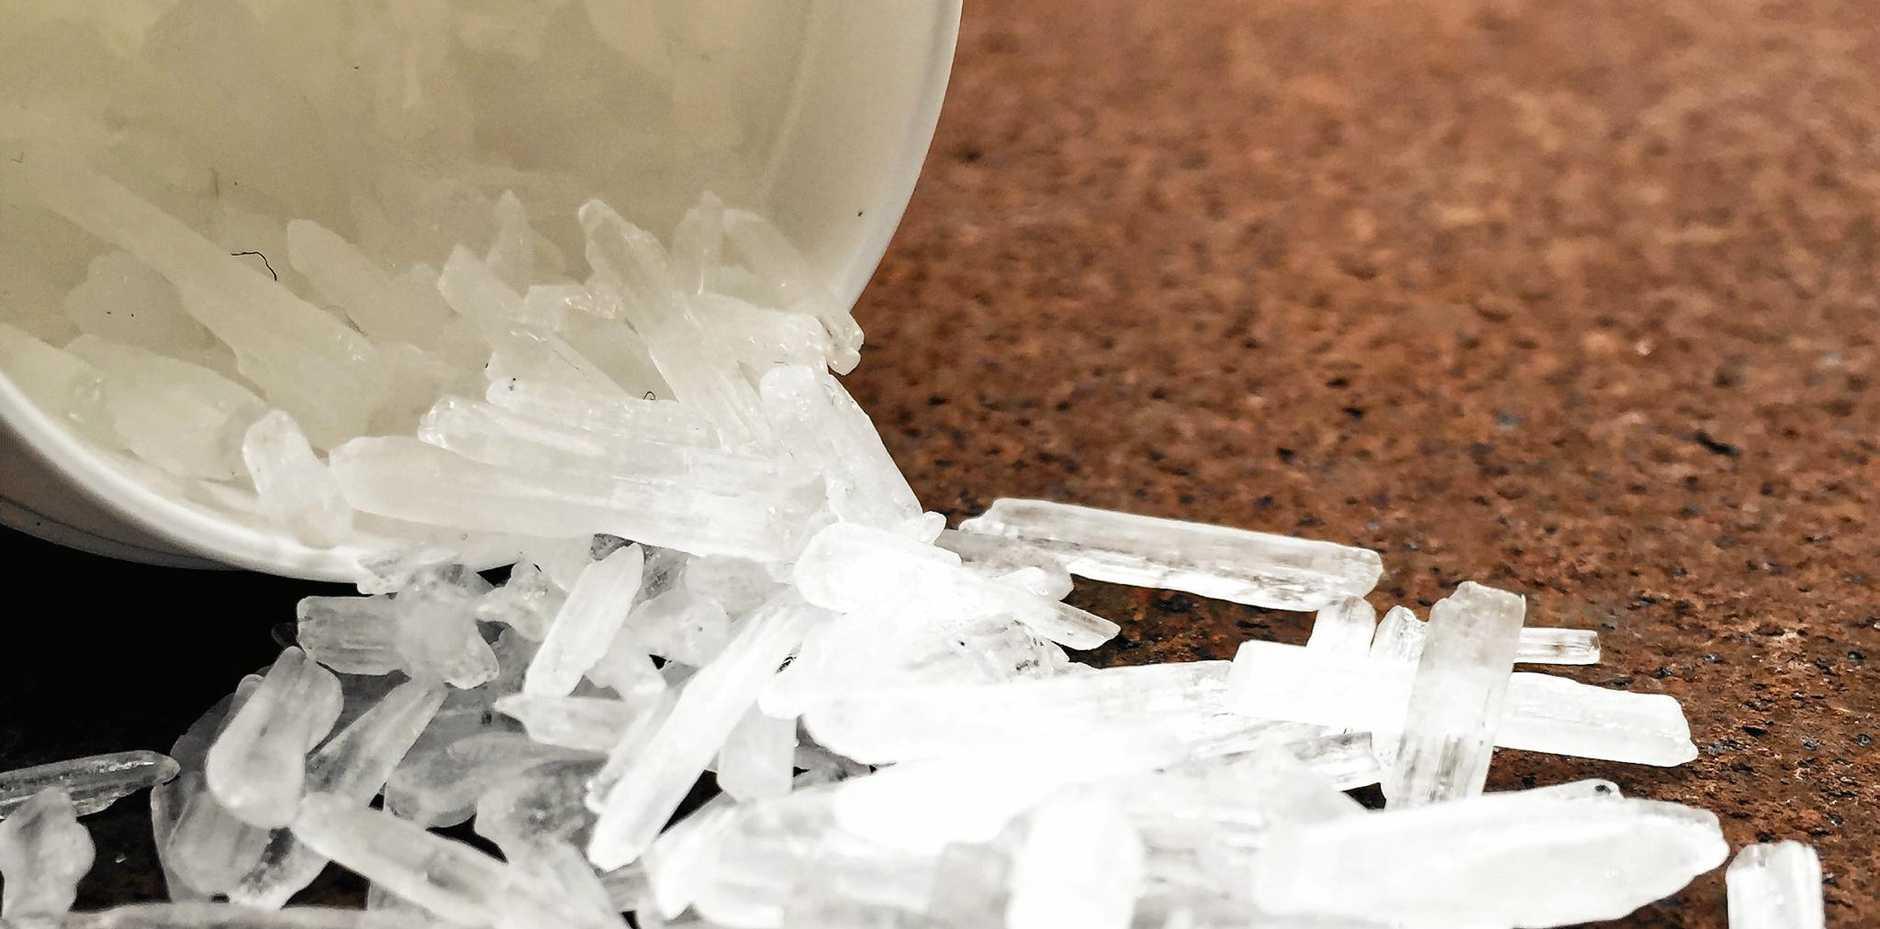 Methamphetamine also known as ice